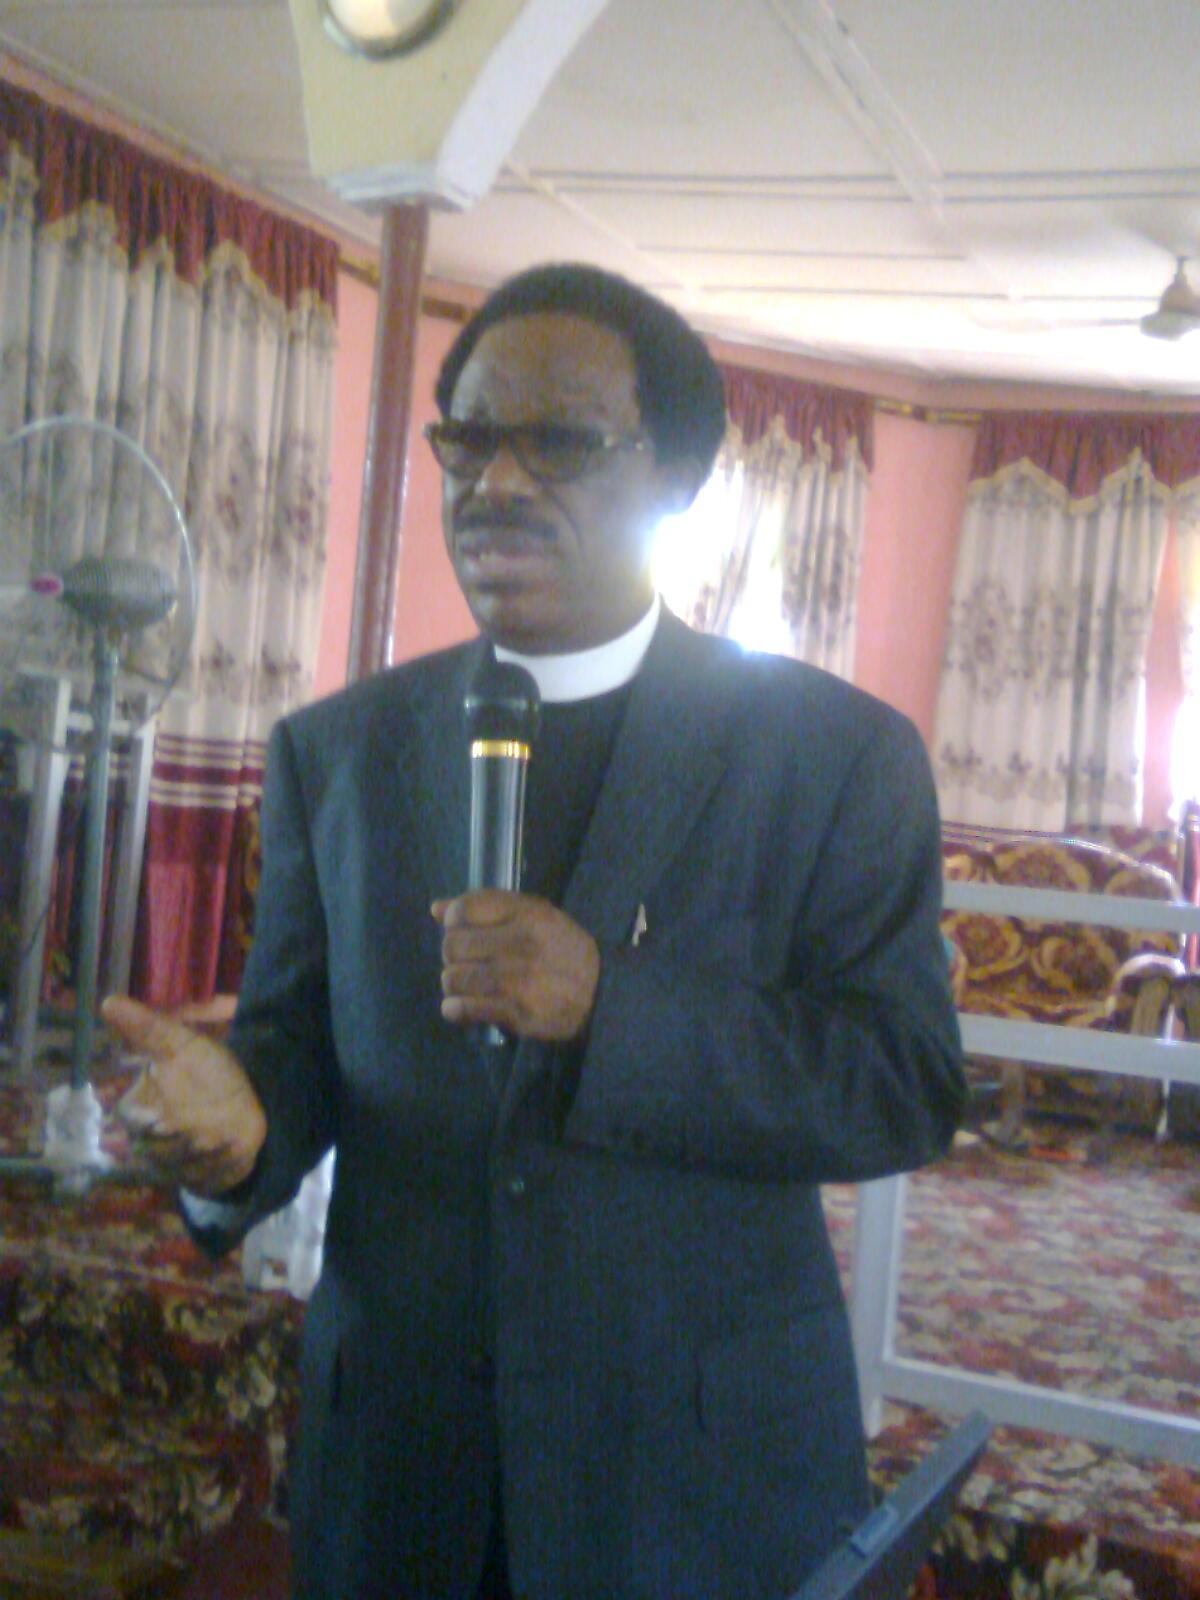 THE APOSTOLIC CHURCH ABA FIELD IGBOLAND TERRITORY NIGERIA